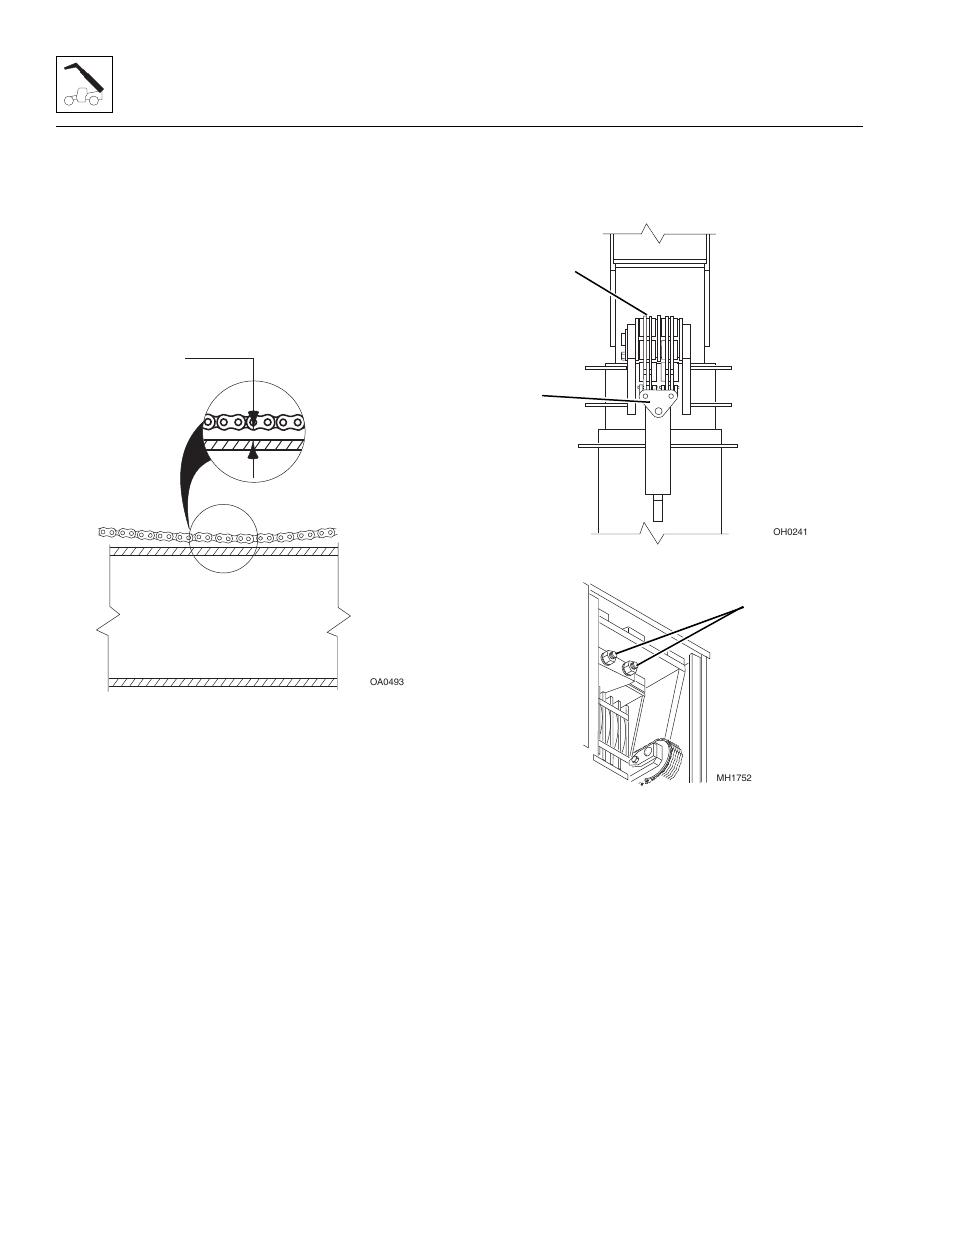 hight resolution of boom chain diagram wiring diagram schematics gold chain 5 boom chain tension check boom chain